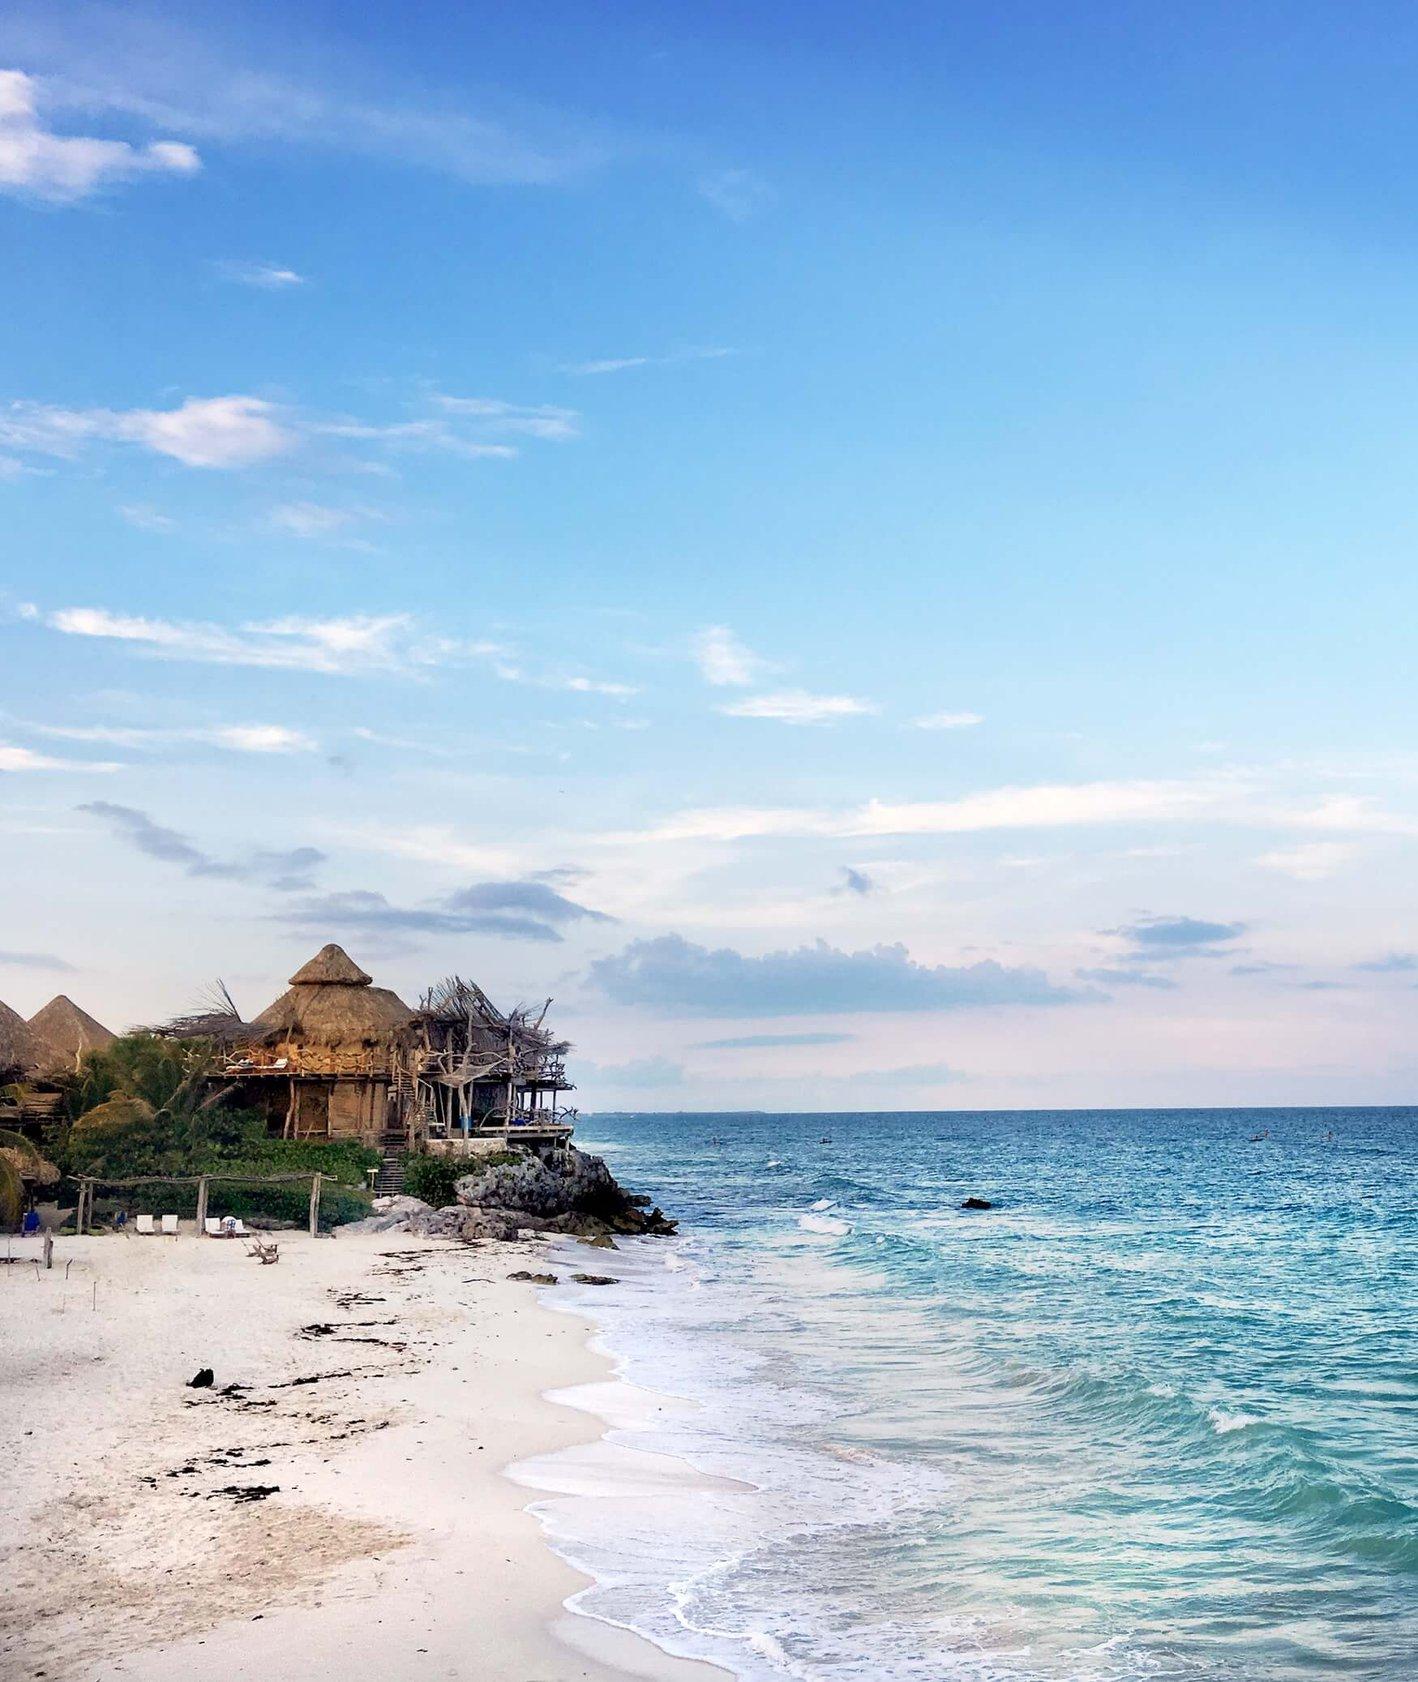 Meksykańska plaża (fot. Moon / unsplash.com)